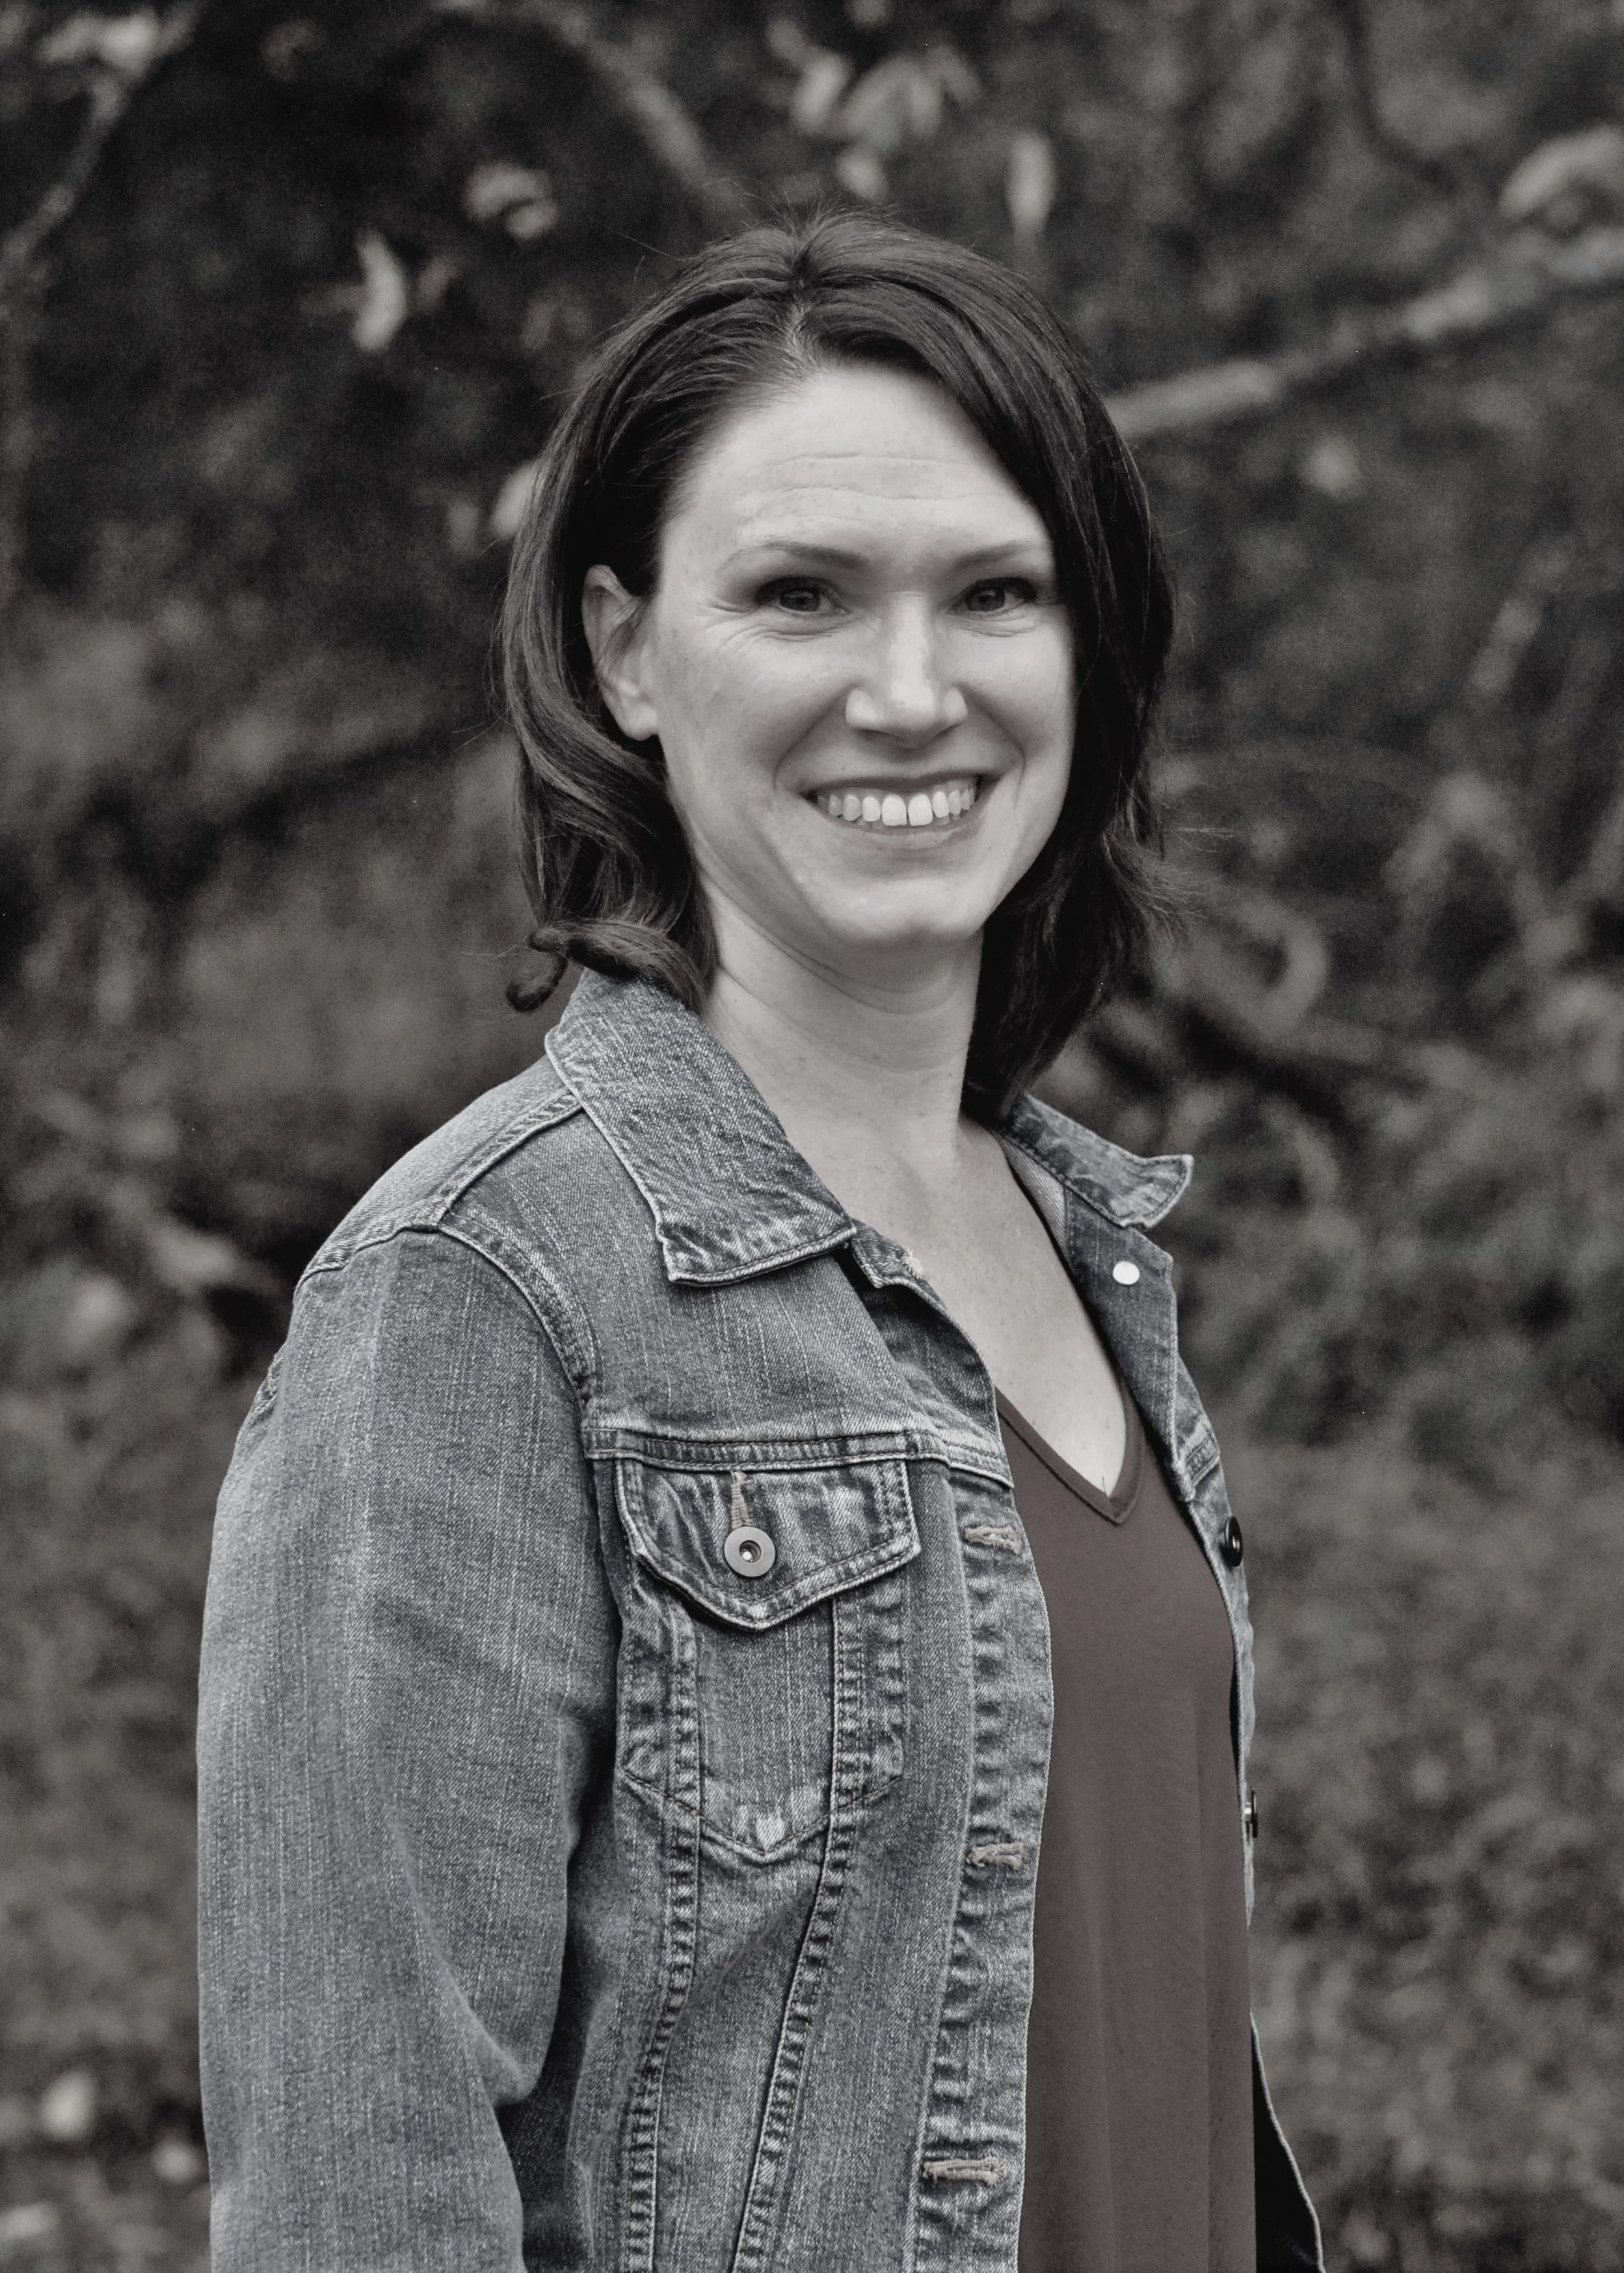 Janice Scholl